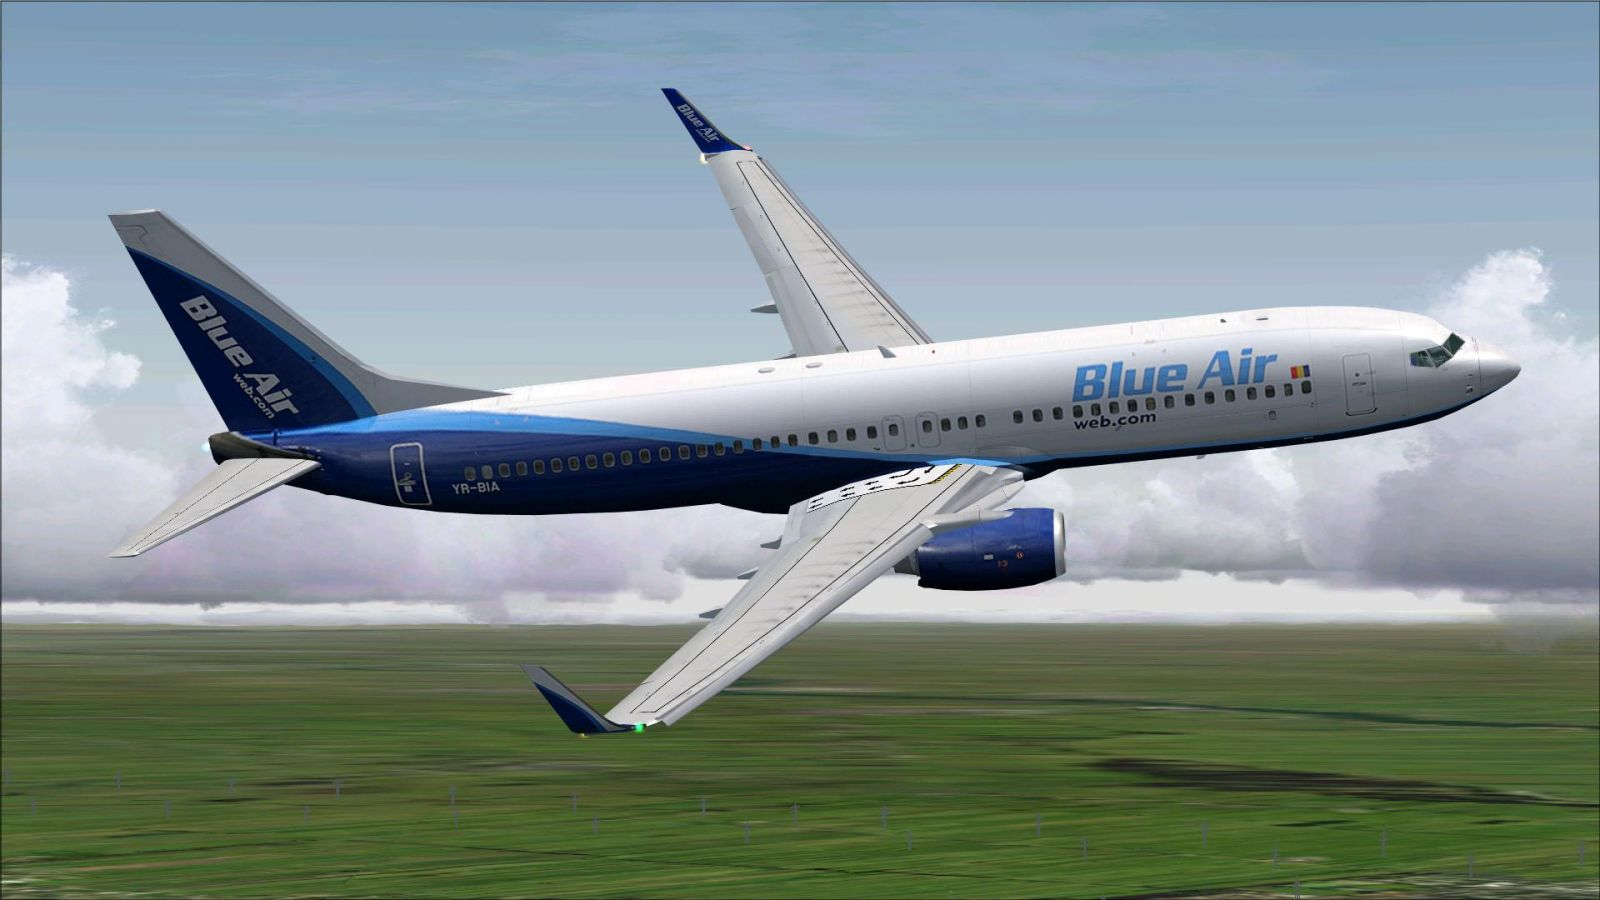 boeing 737 aircraft aviation - photo #27